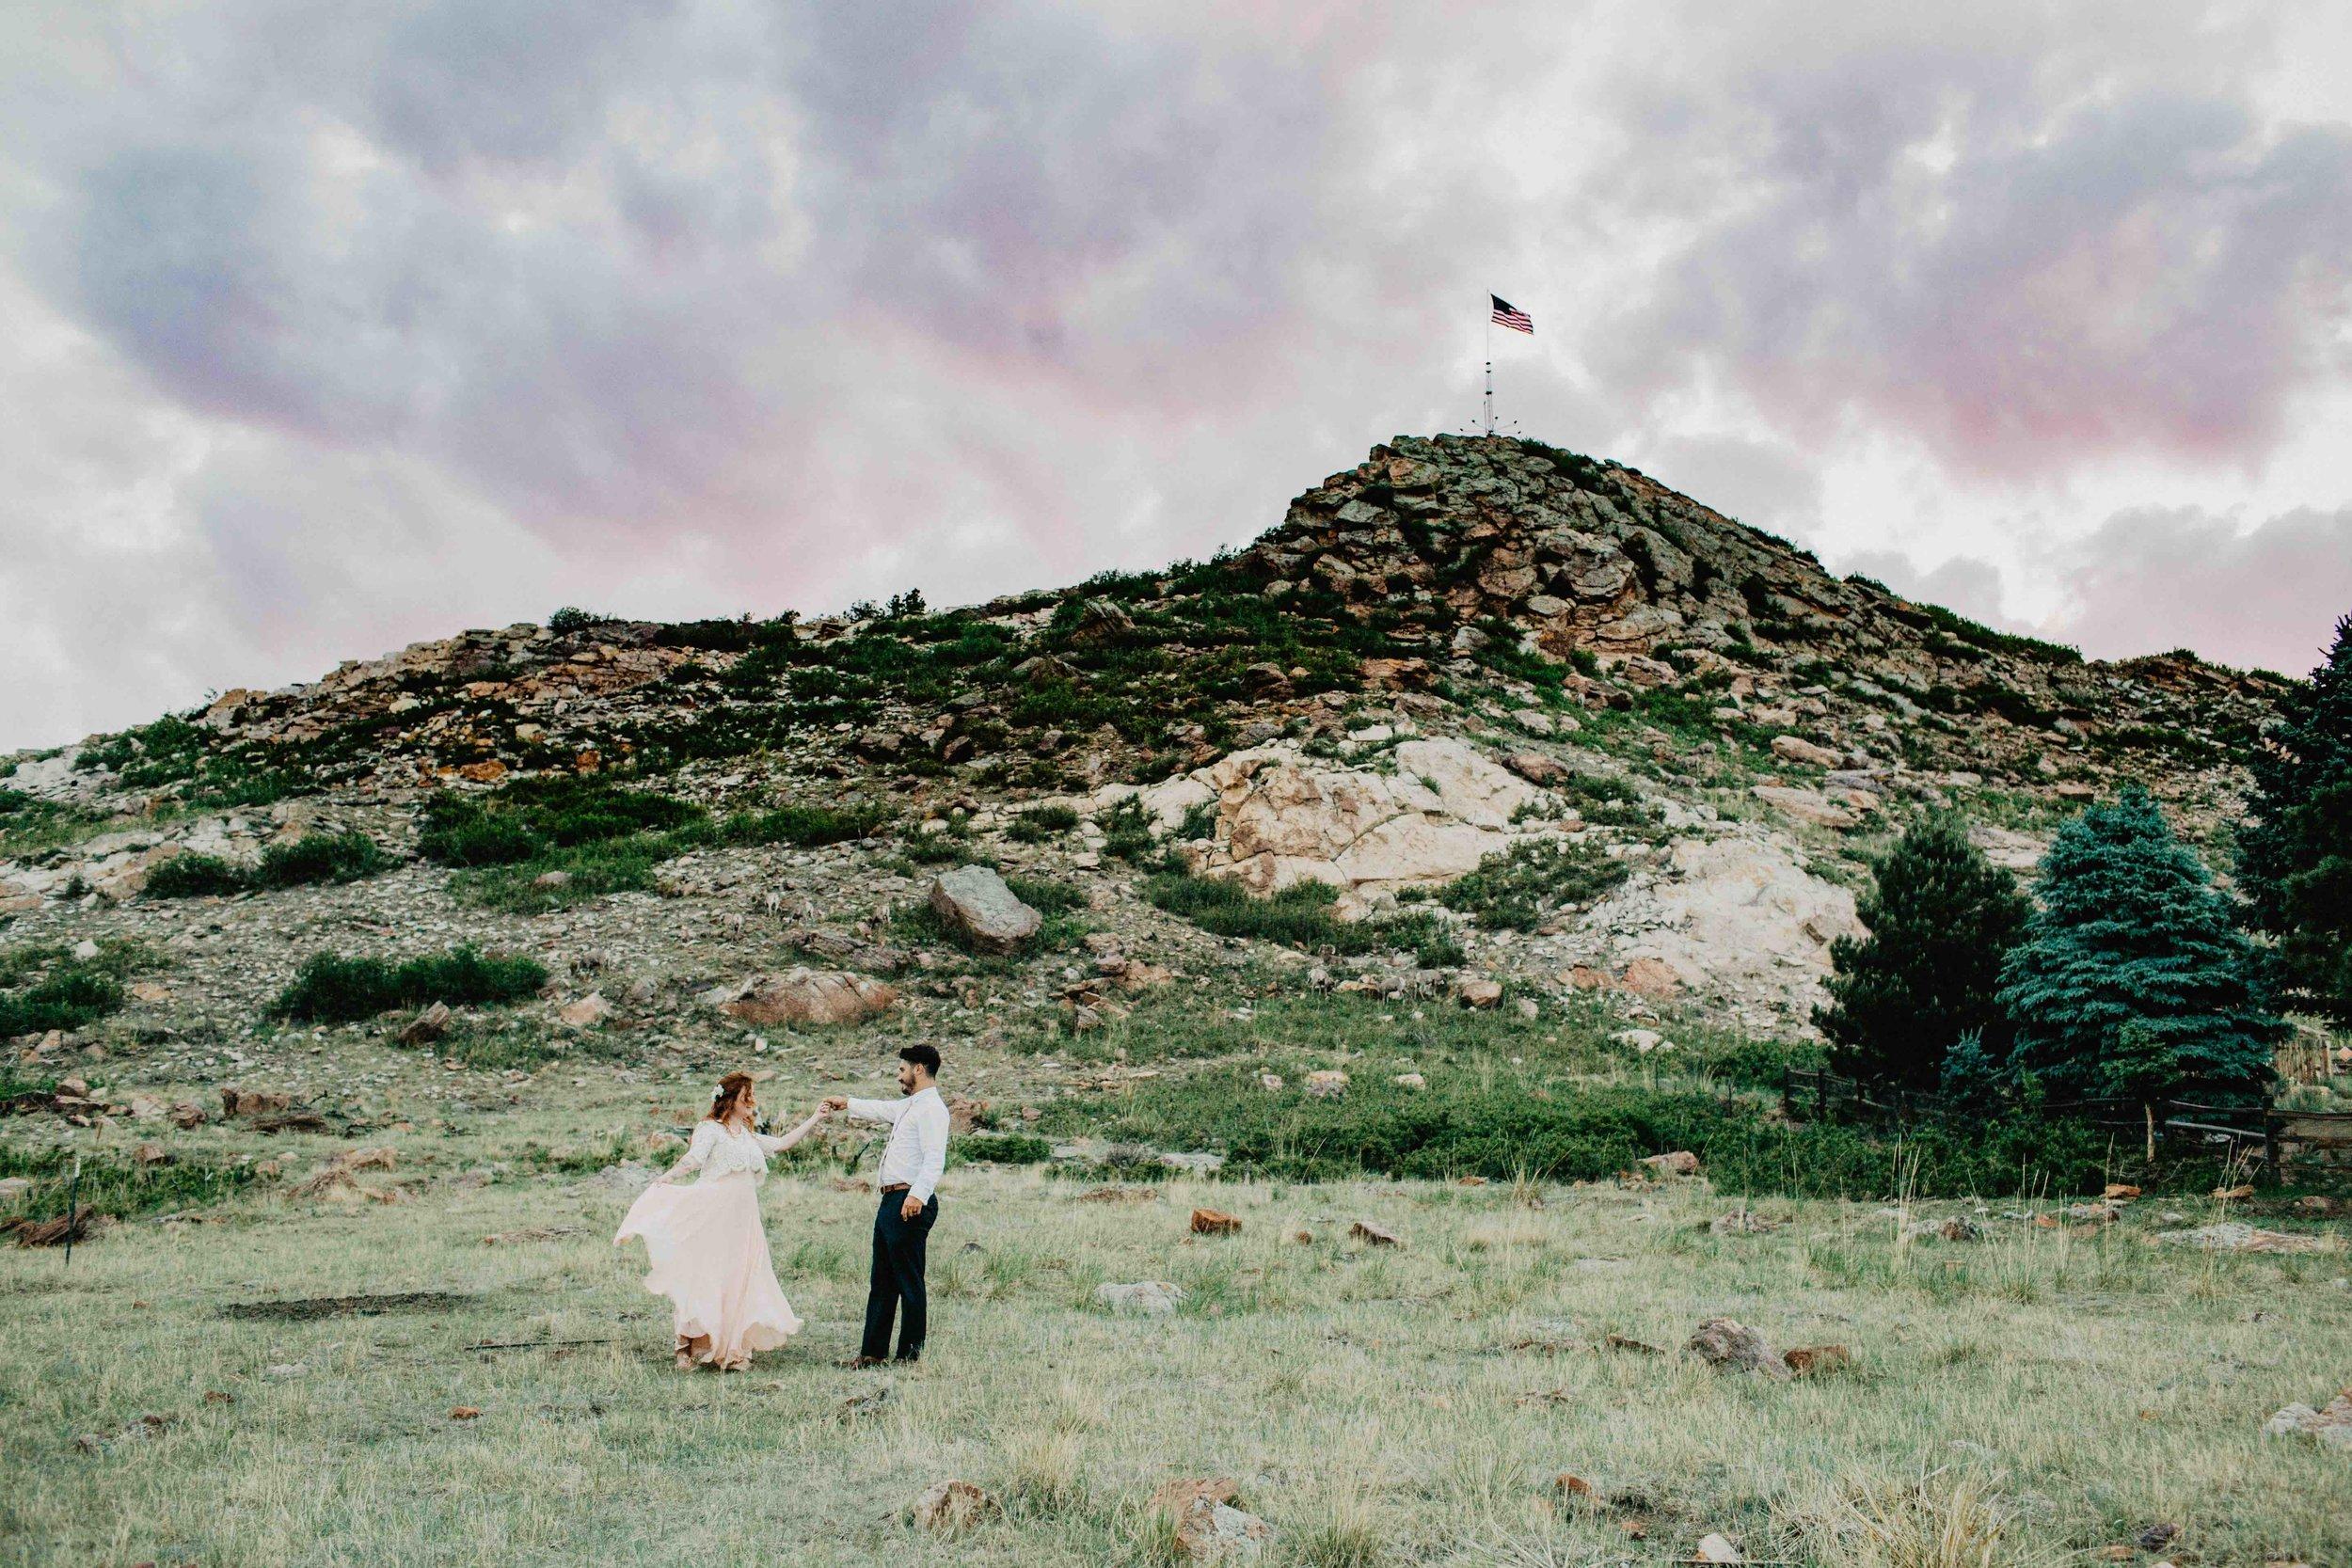 -colorado-wedding-photographer-denver-springs-vail-607A4548.jpeg